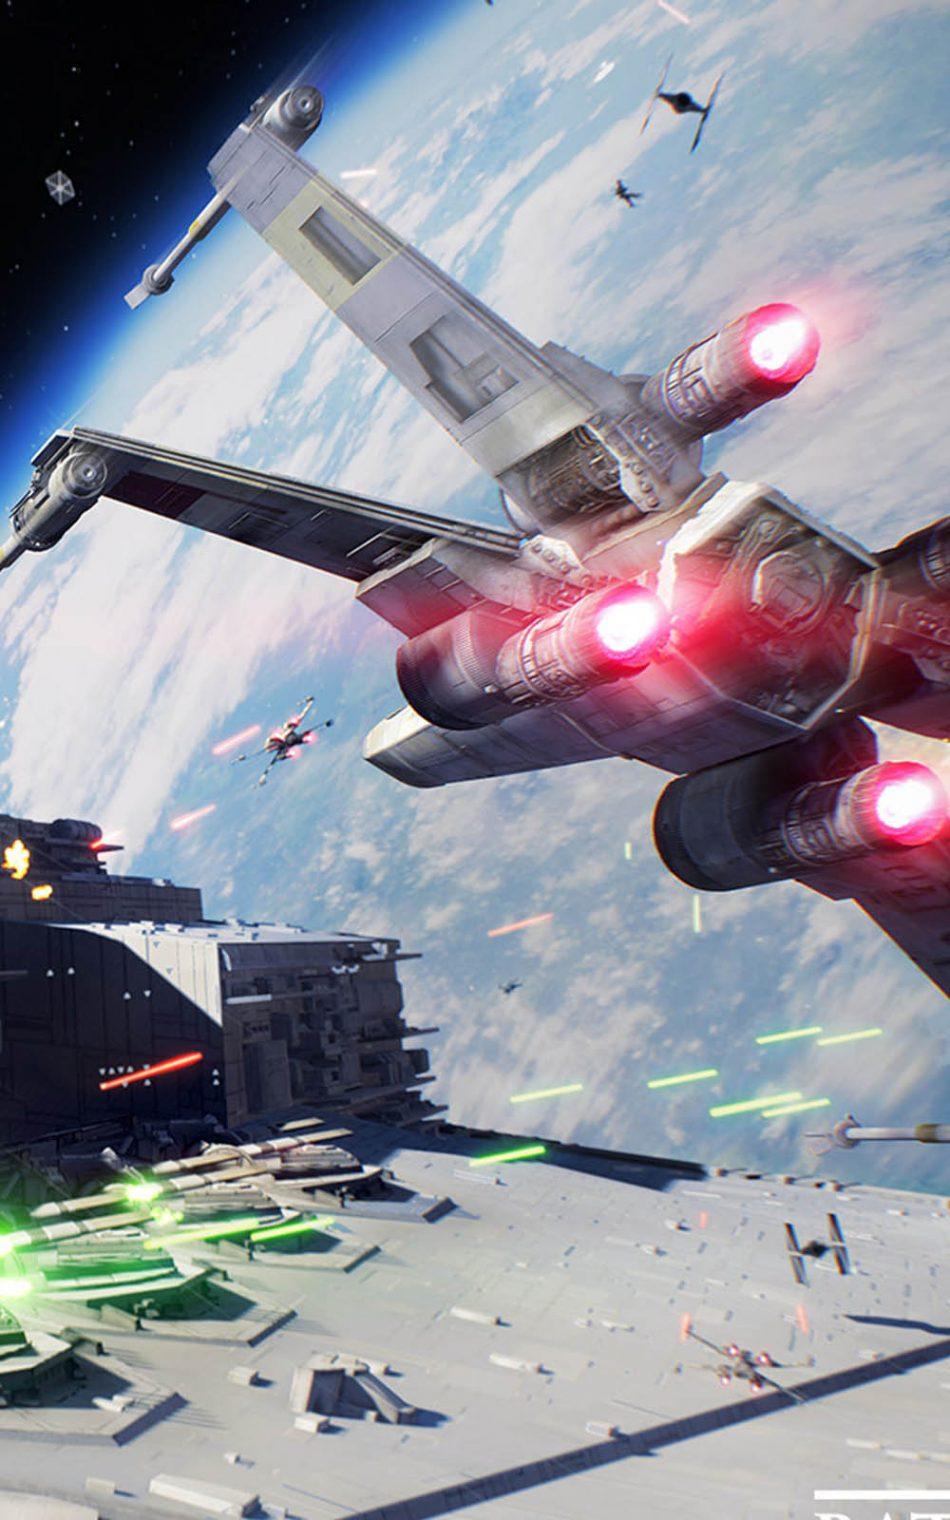 Spaceship Star Wars Battlefront Ii 4k Ultra Hd Mobile Wallpaper